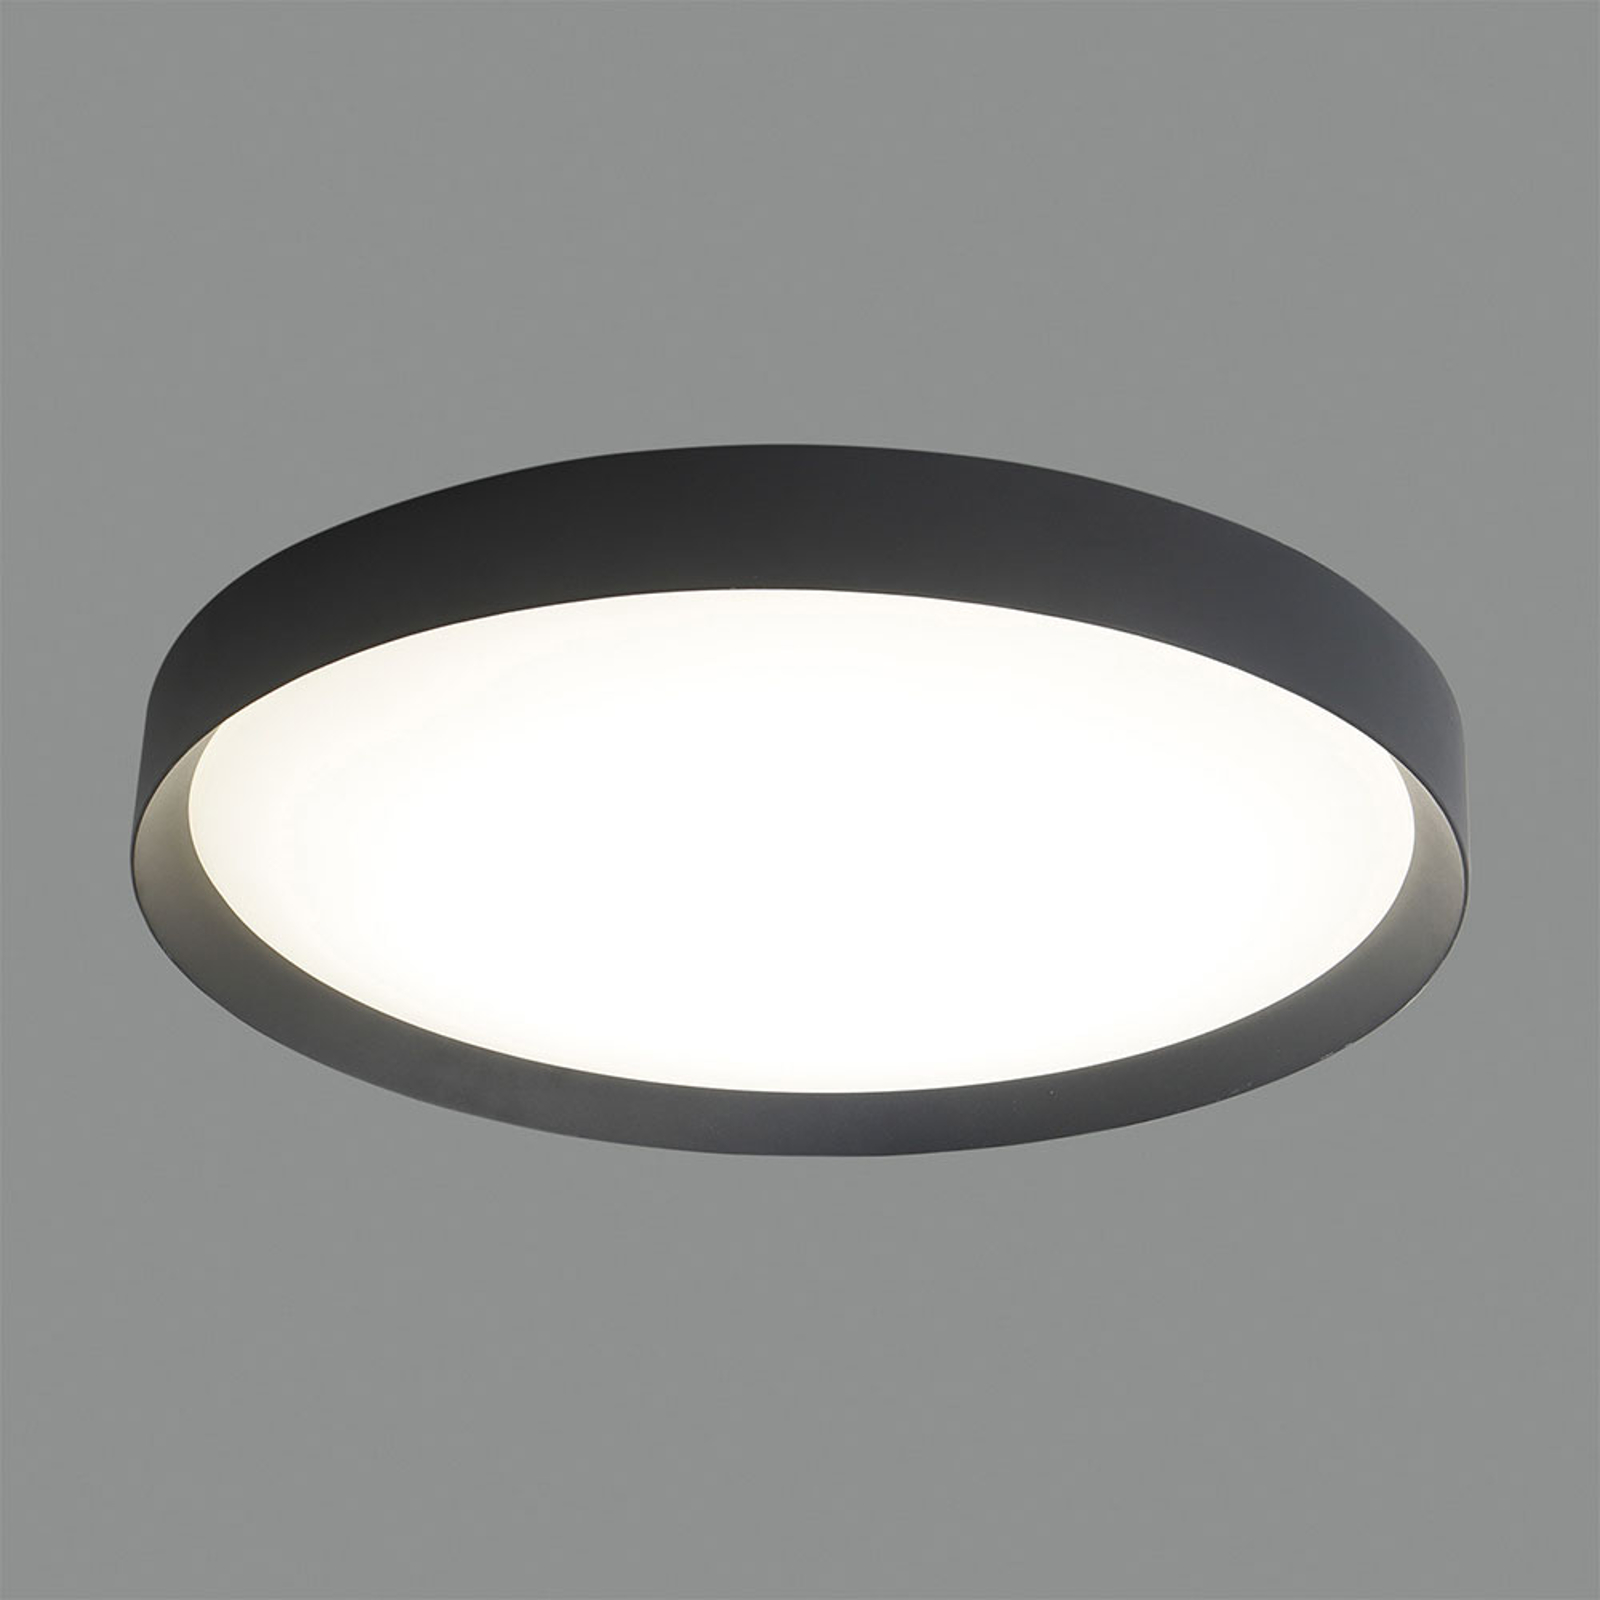 LED-Deckenlampe Minsk DALI Ø 60cm Casambi schwarz